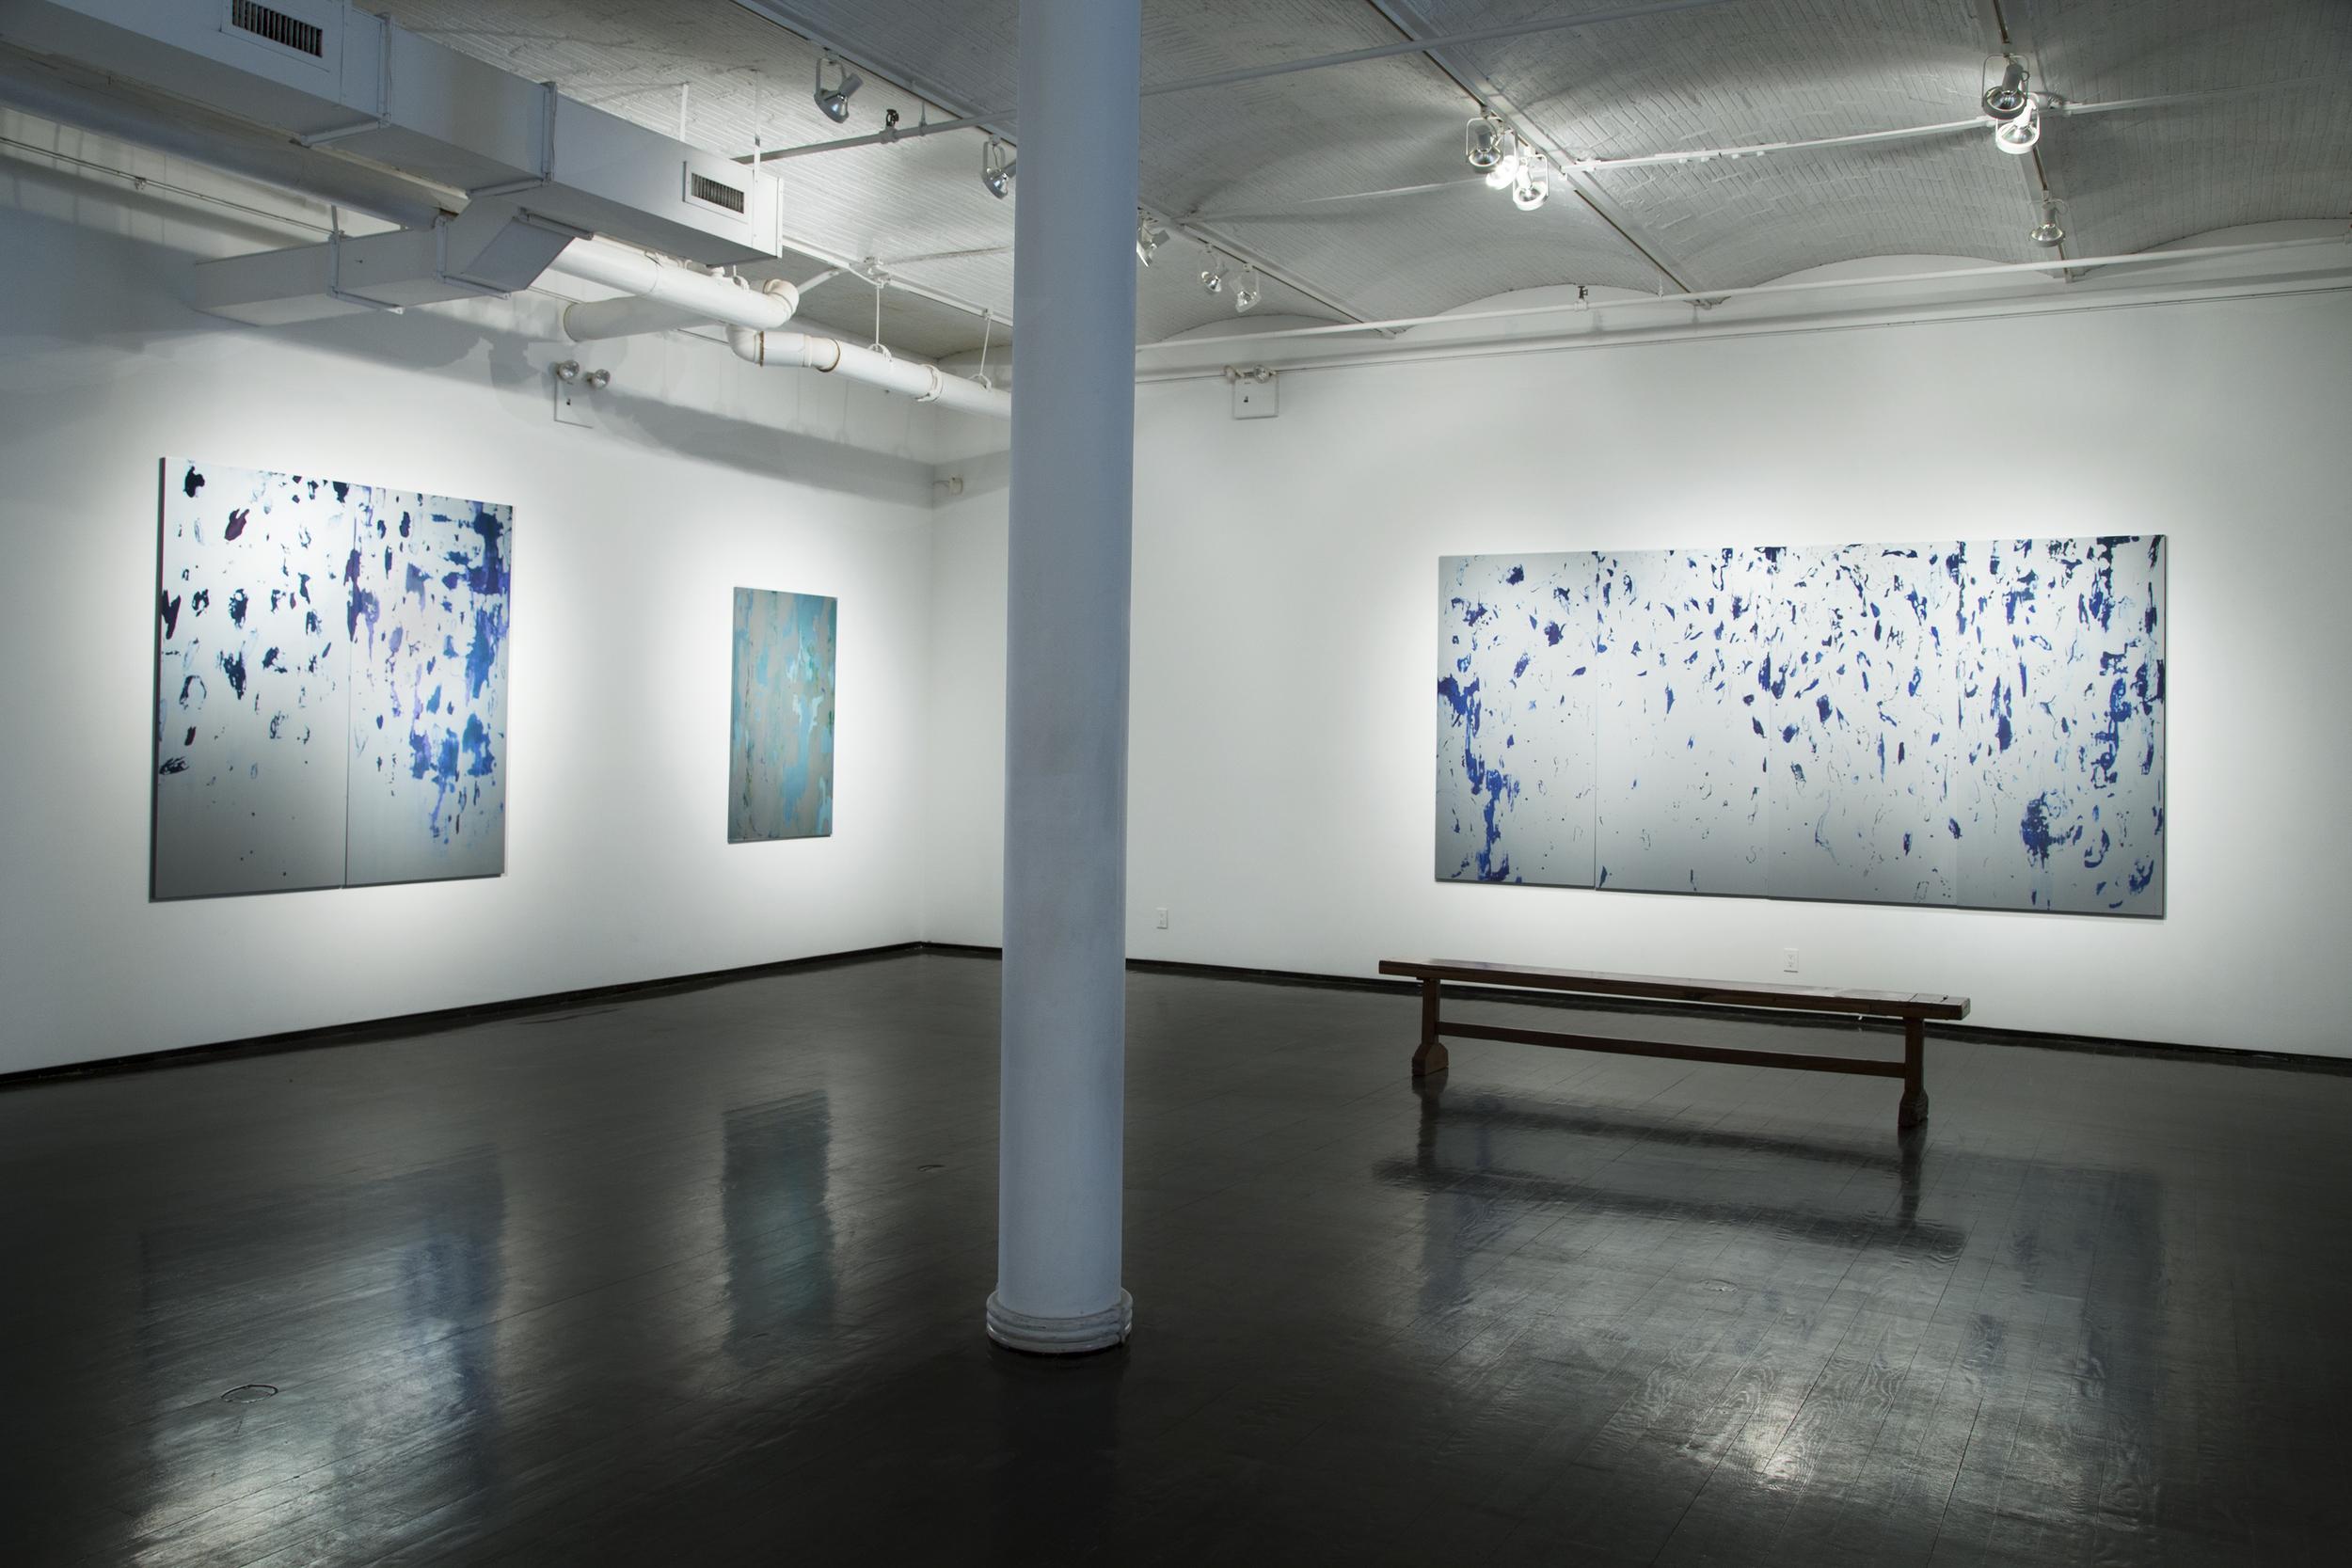 Dillon_Gallery_Yuzu_Ono_Paintings_Exhibit_NYC.jpg